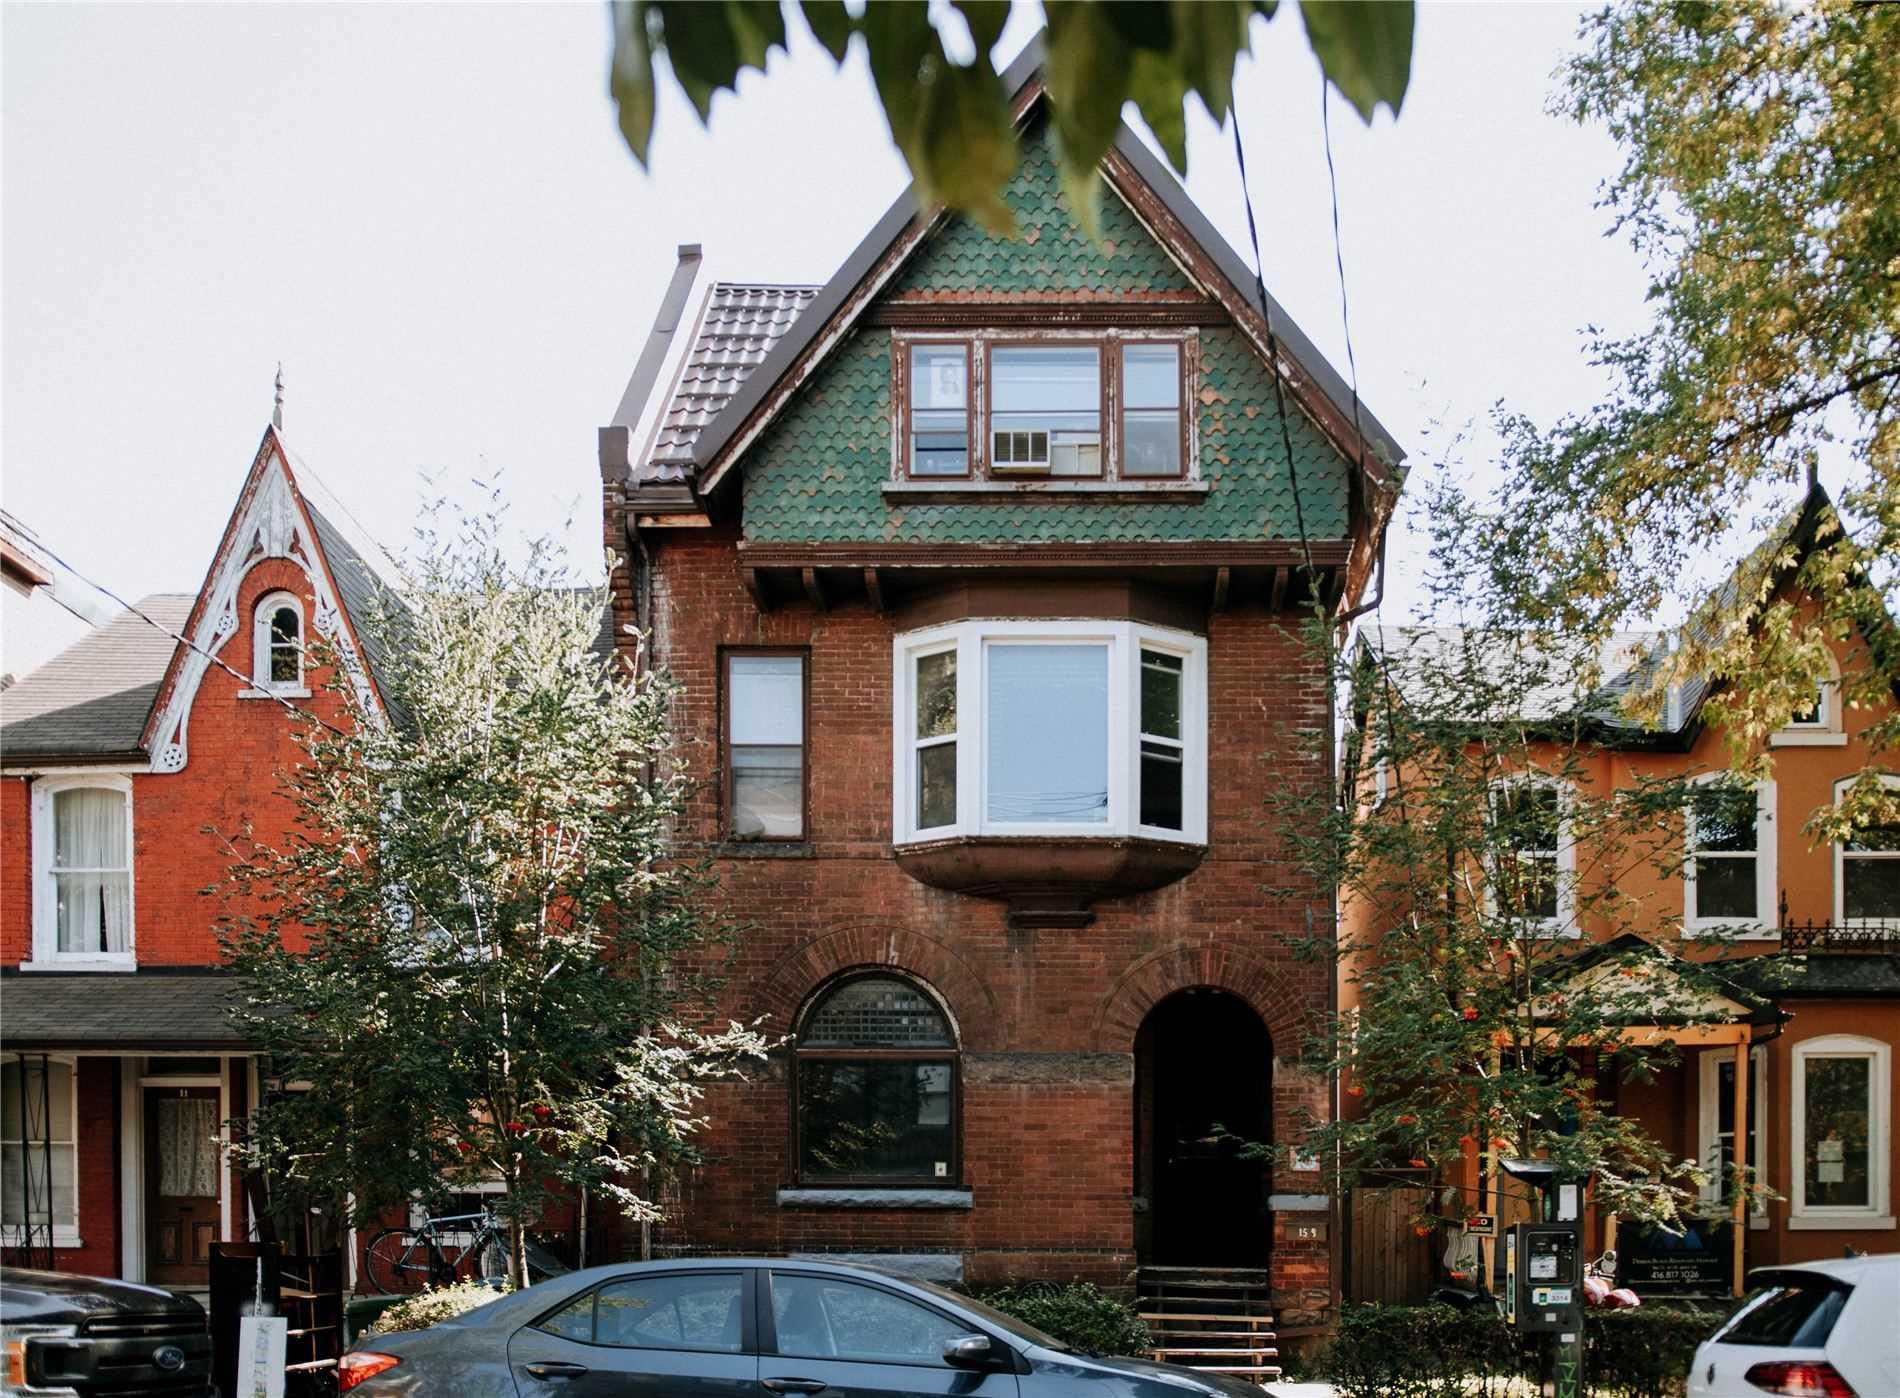 15 D'arcy St, Toronto, Ontario M5T1J8, 8 Bedrooms Bedrooms, 11 Rooms Rooms,4 BathroomsBathrooms,Semi-detached,For Sale,D'arcy,C5378785